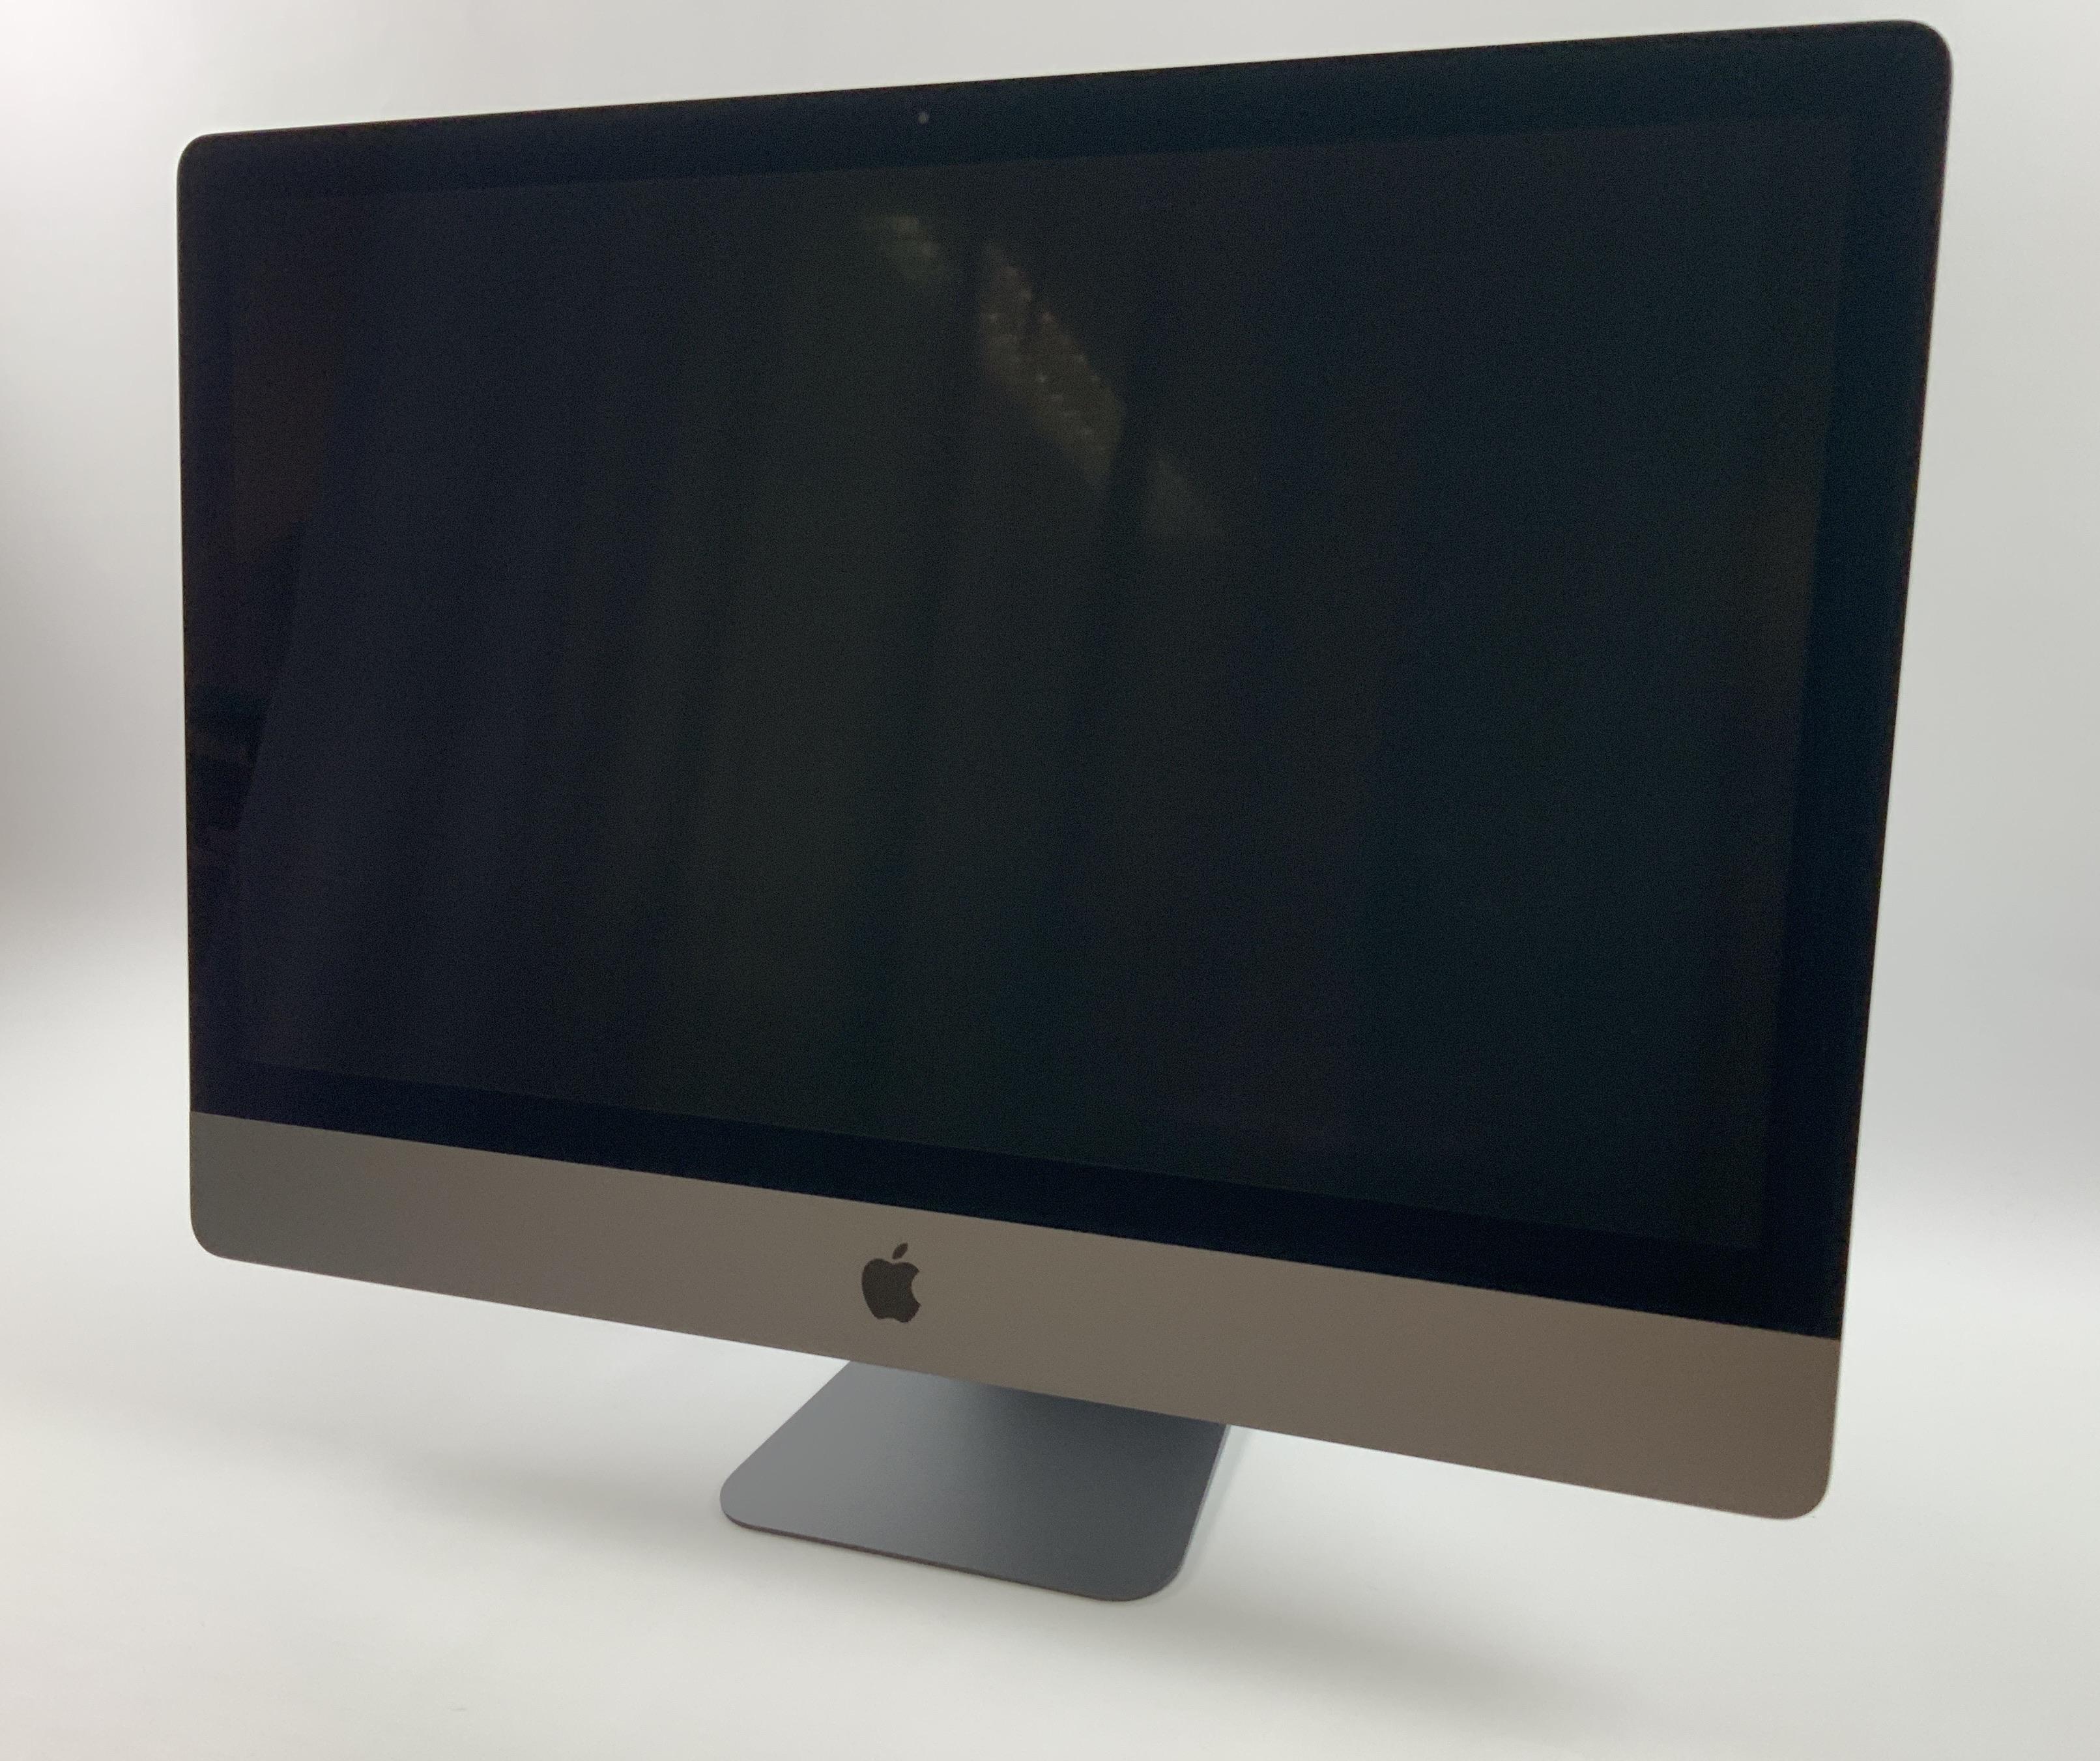 iMac Pro 2017 (Intel 8-Core Xeon W 3.2 GHz 32 GB RAM 1 TB SSD), Intel 8-Core Xeon W 3.2 GHz, 32 GB RAM, 1 TB SSD, Kuva 1